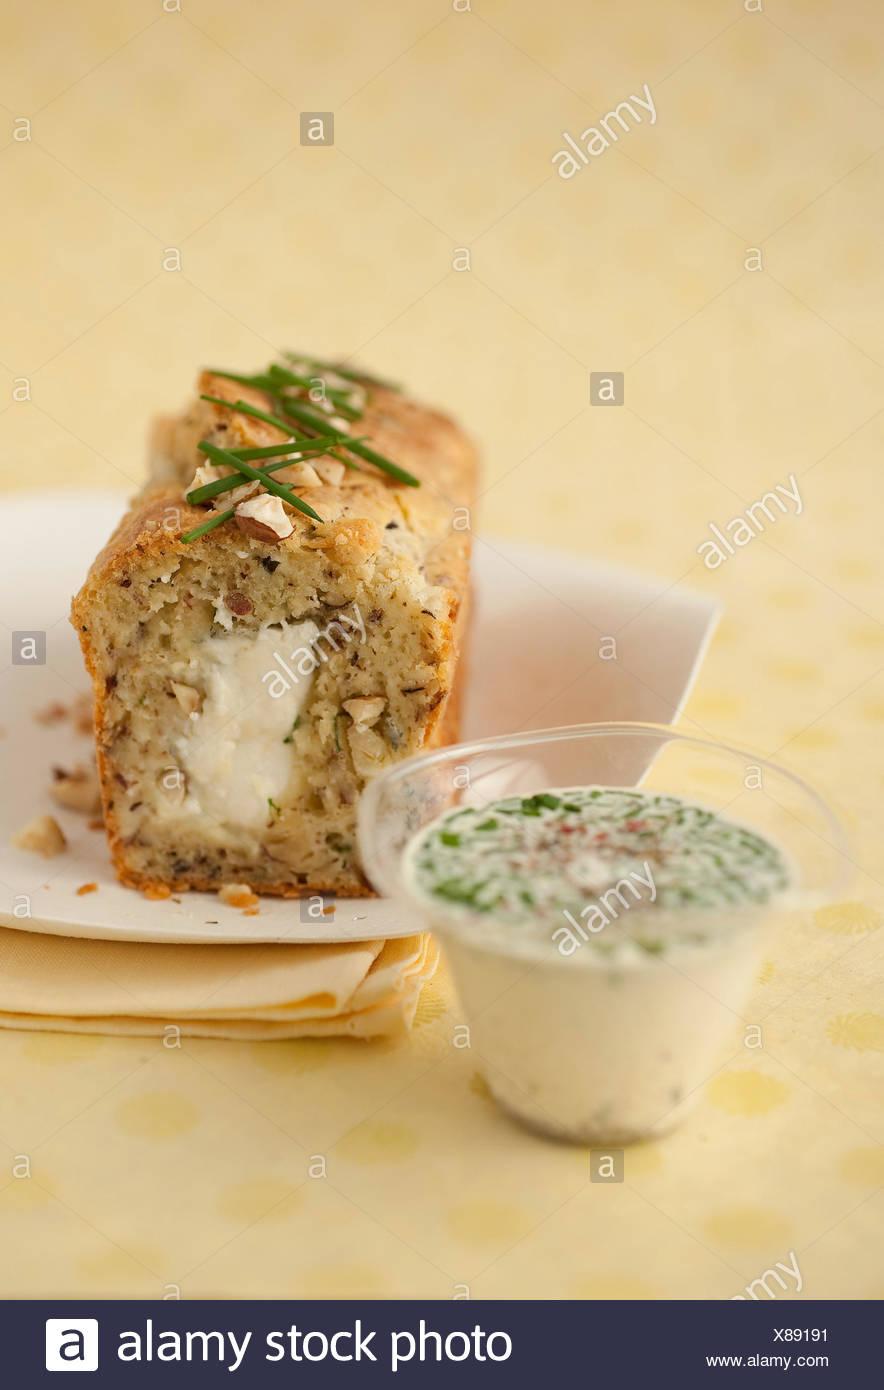 Goat's cheese,hazelnut and chive savoury cake,creamy chive sauce - Stock Image